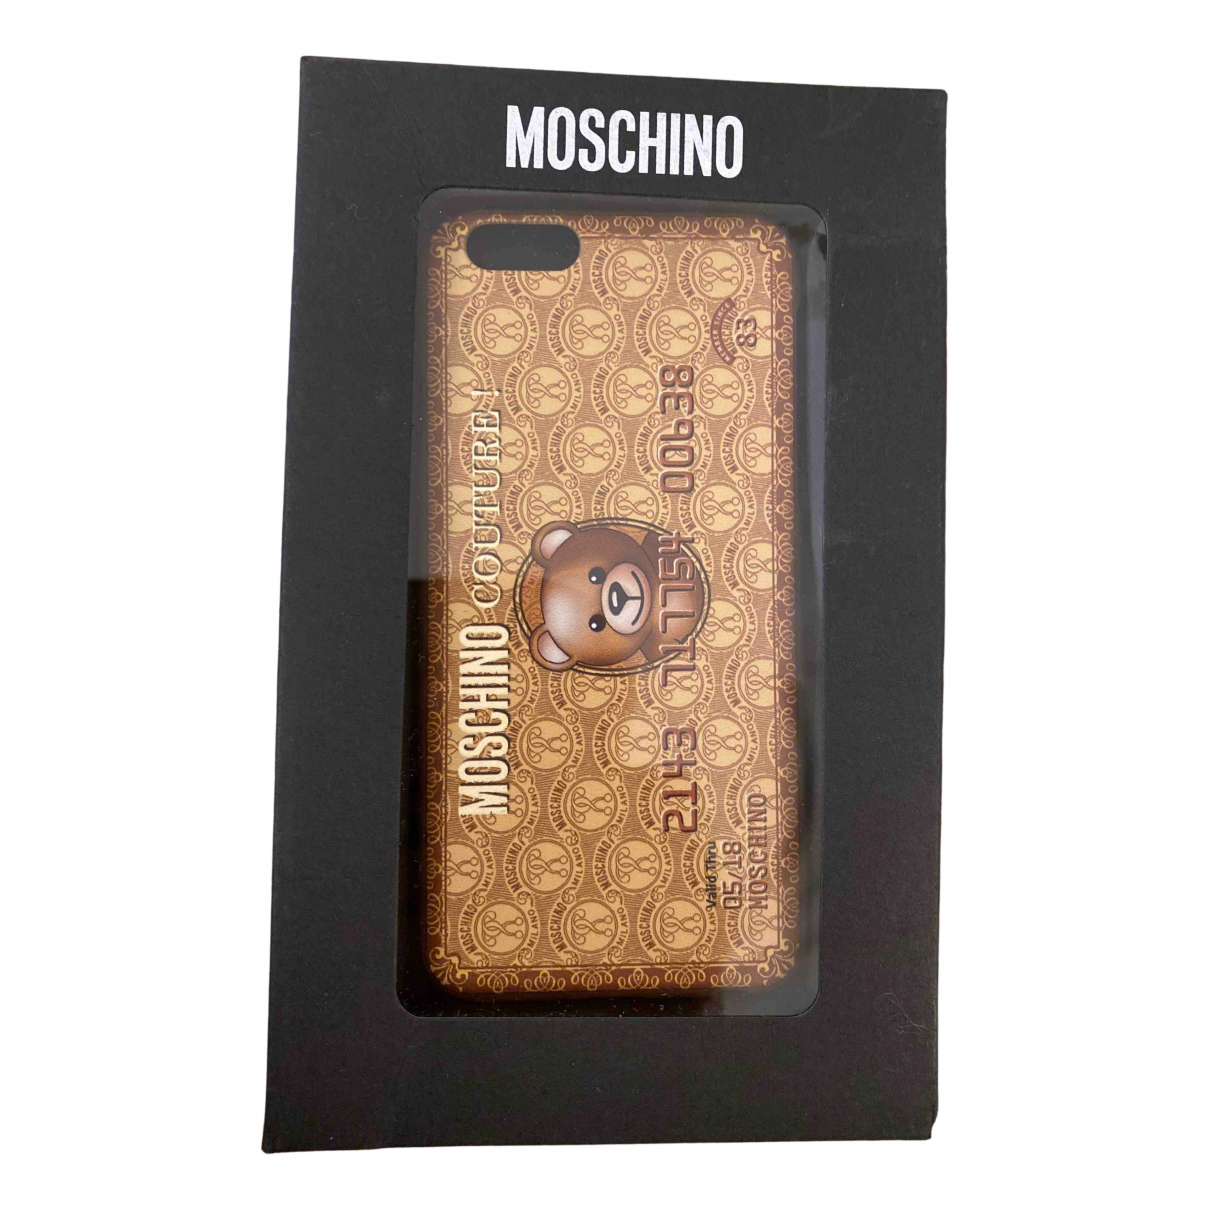 Moschino - Accessoires   pour lifestyle - dore